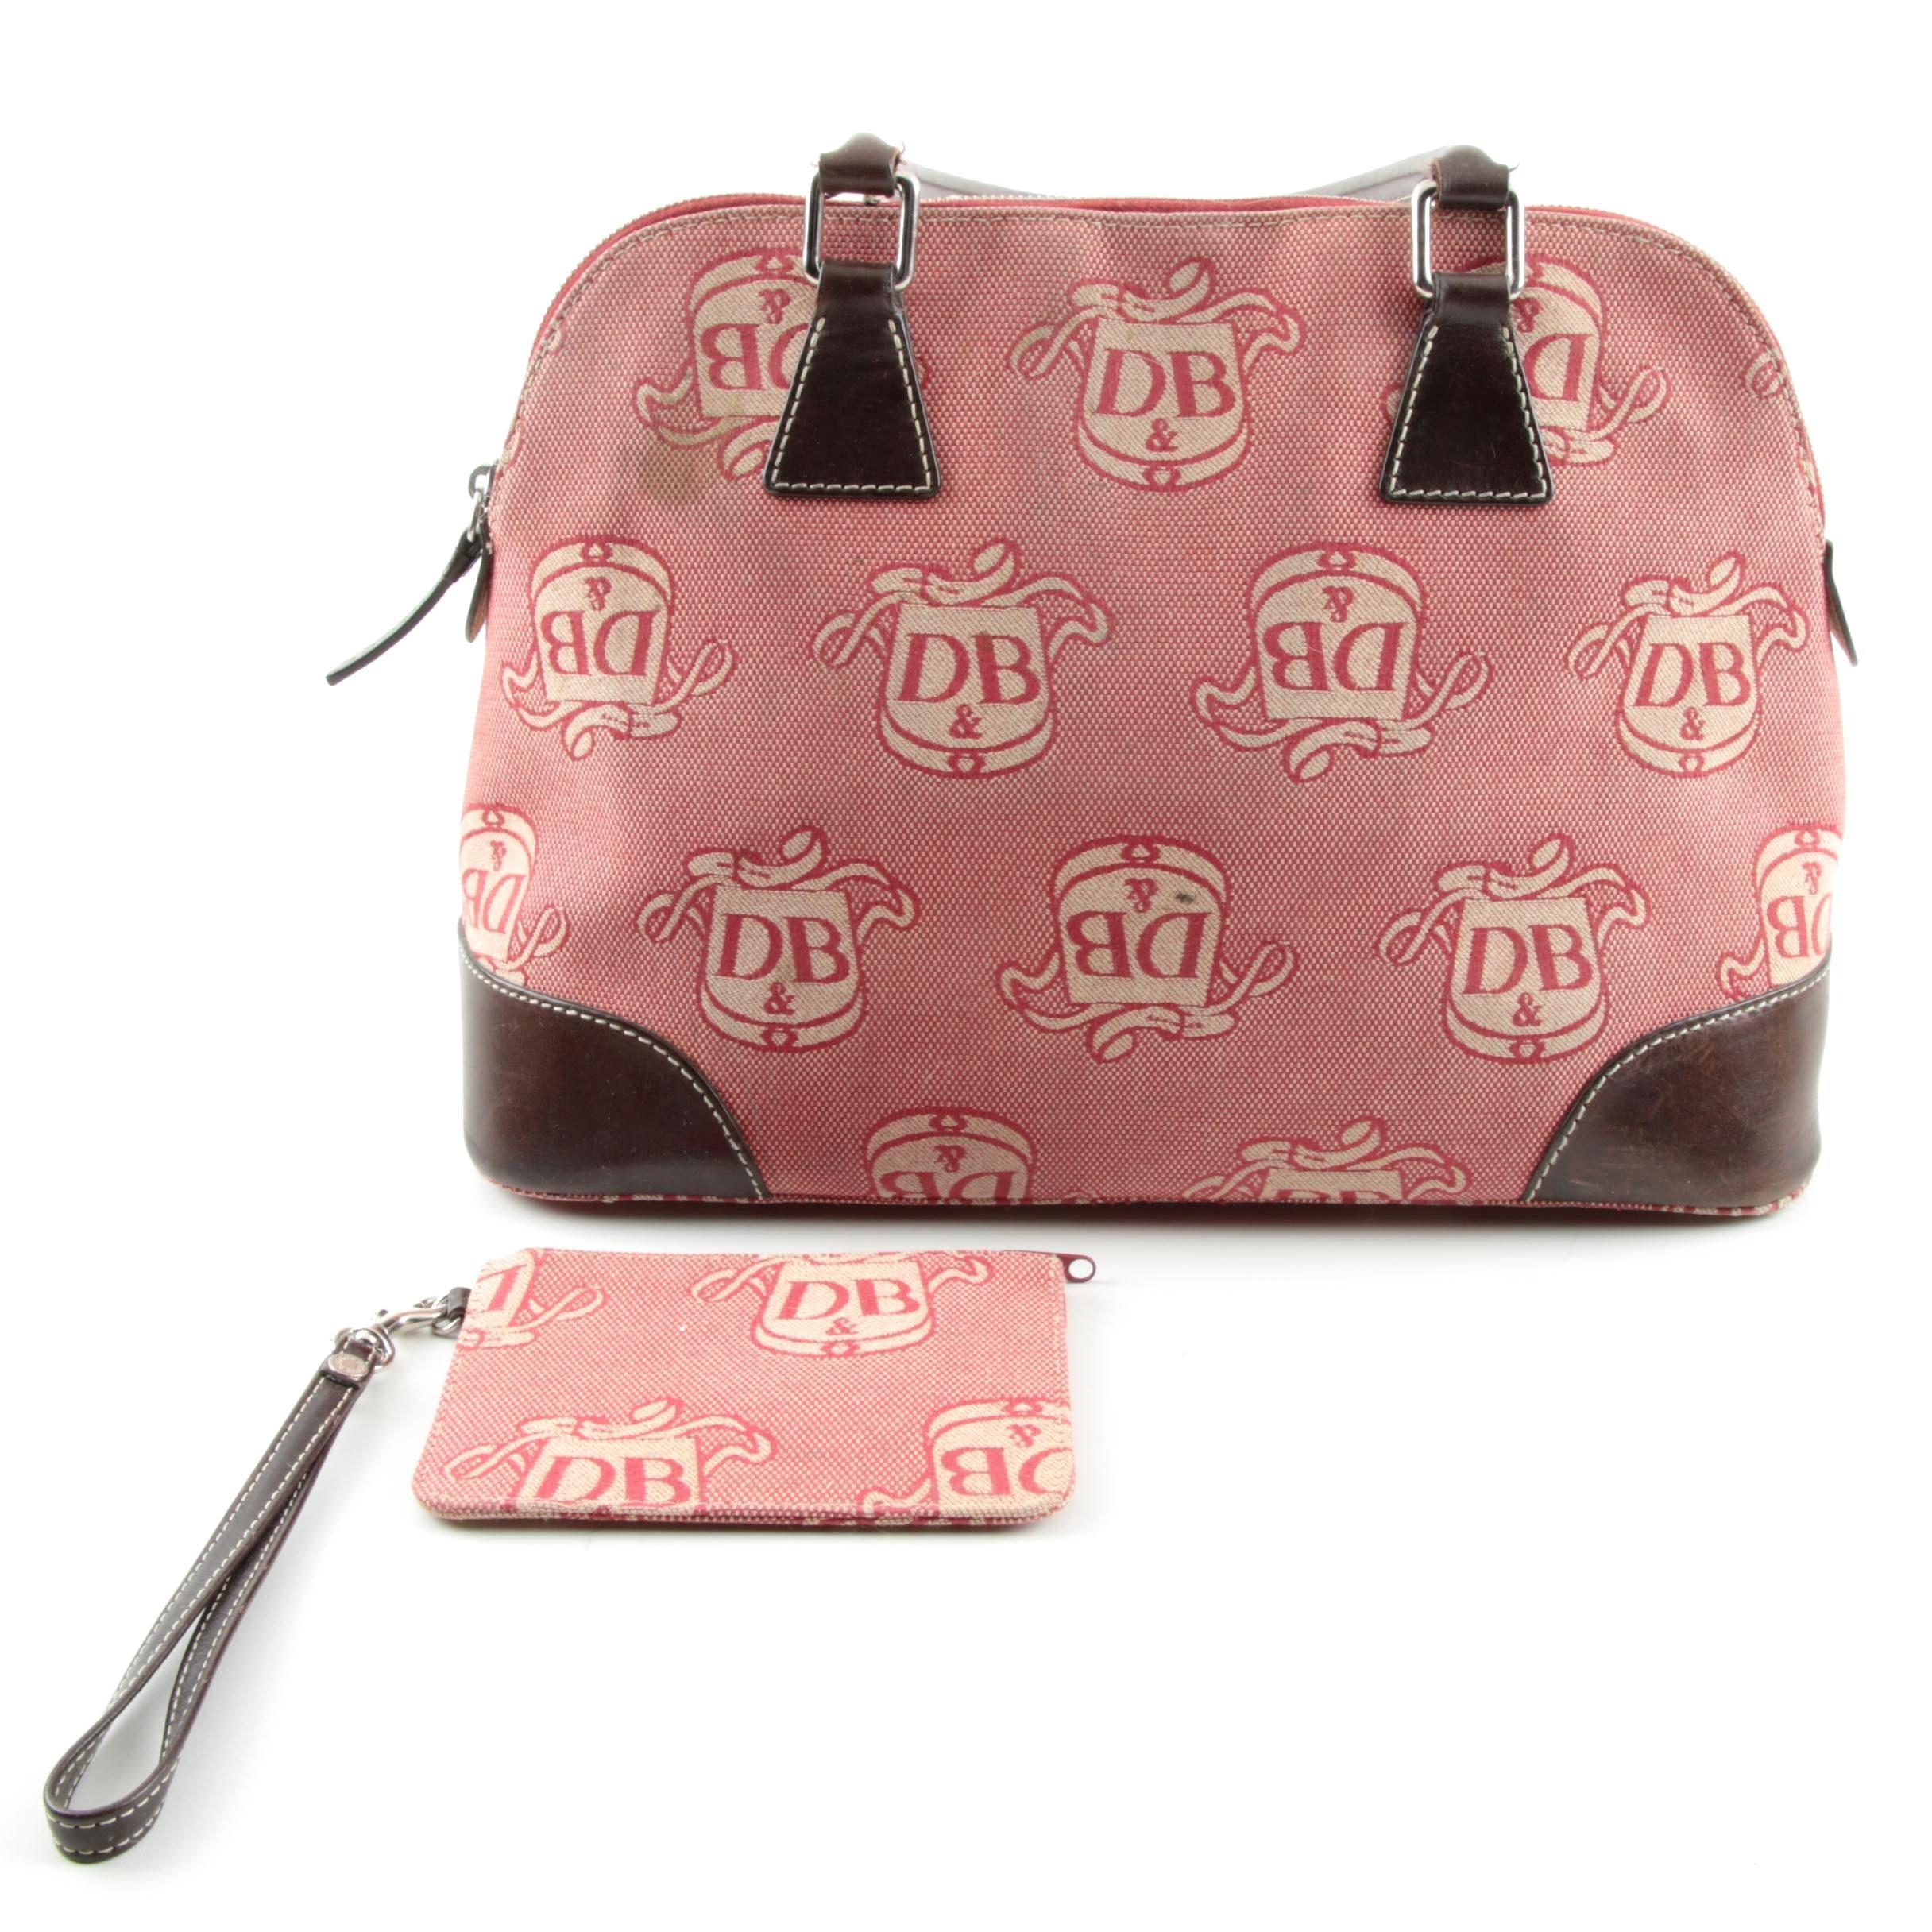 Dooney & Bourke Jacquard Bag with Matching Wristlet